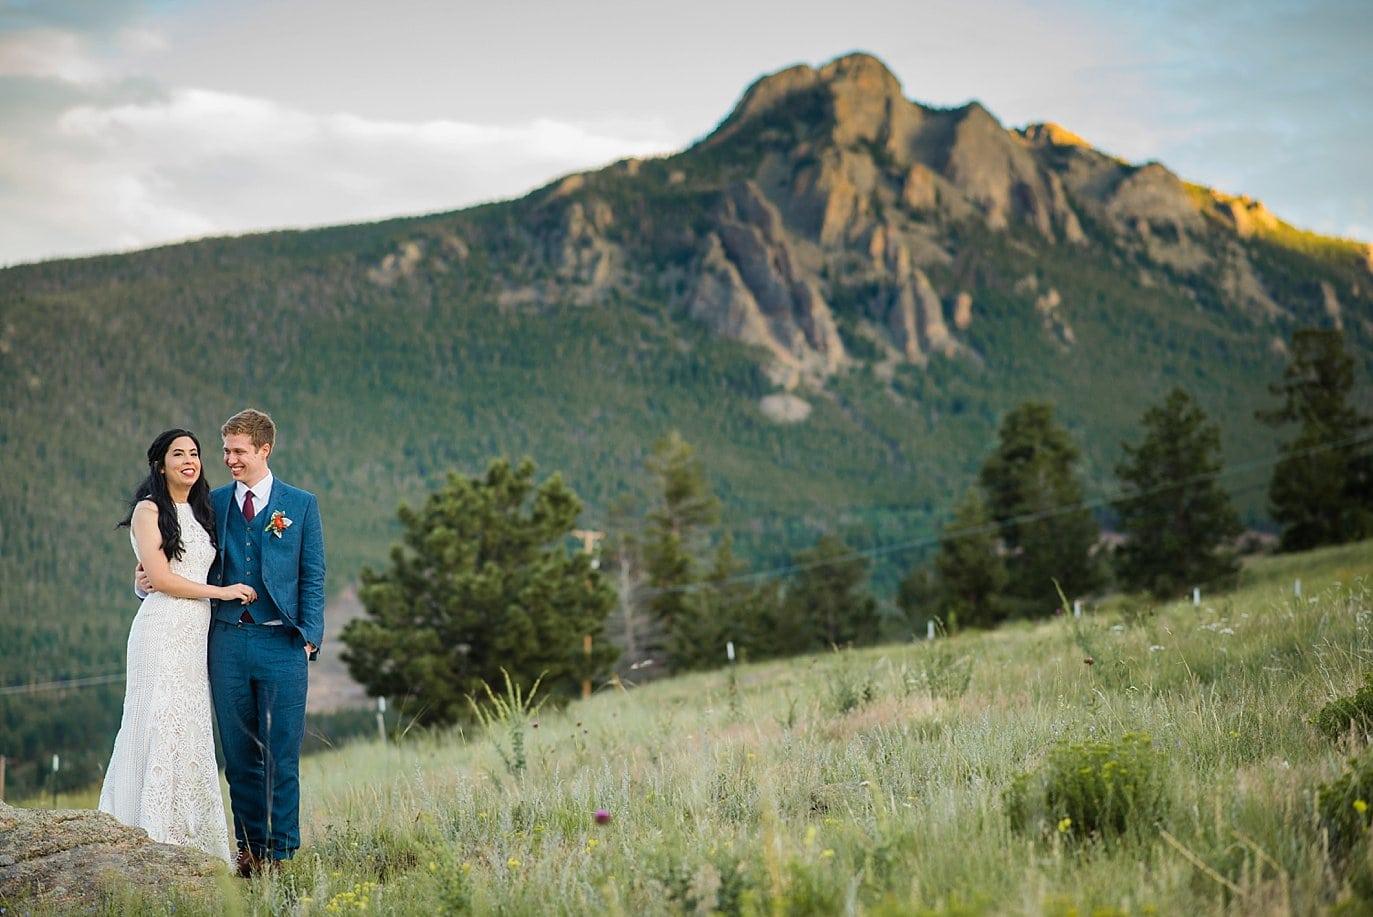 Taharaa Mountain Lodge sunset wedding couple at Rocky Mountain National Park Wedding by Rocky Mountain Colorado Wedding Photographer Jennie Crate